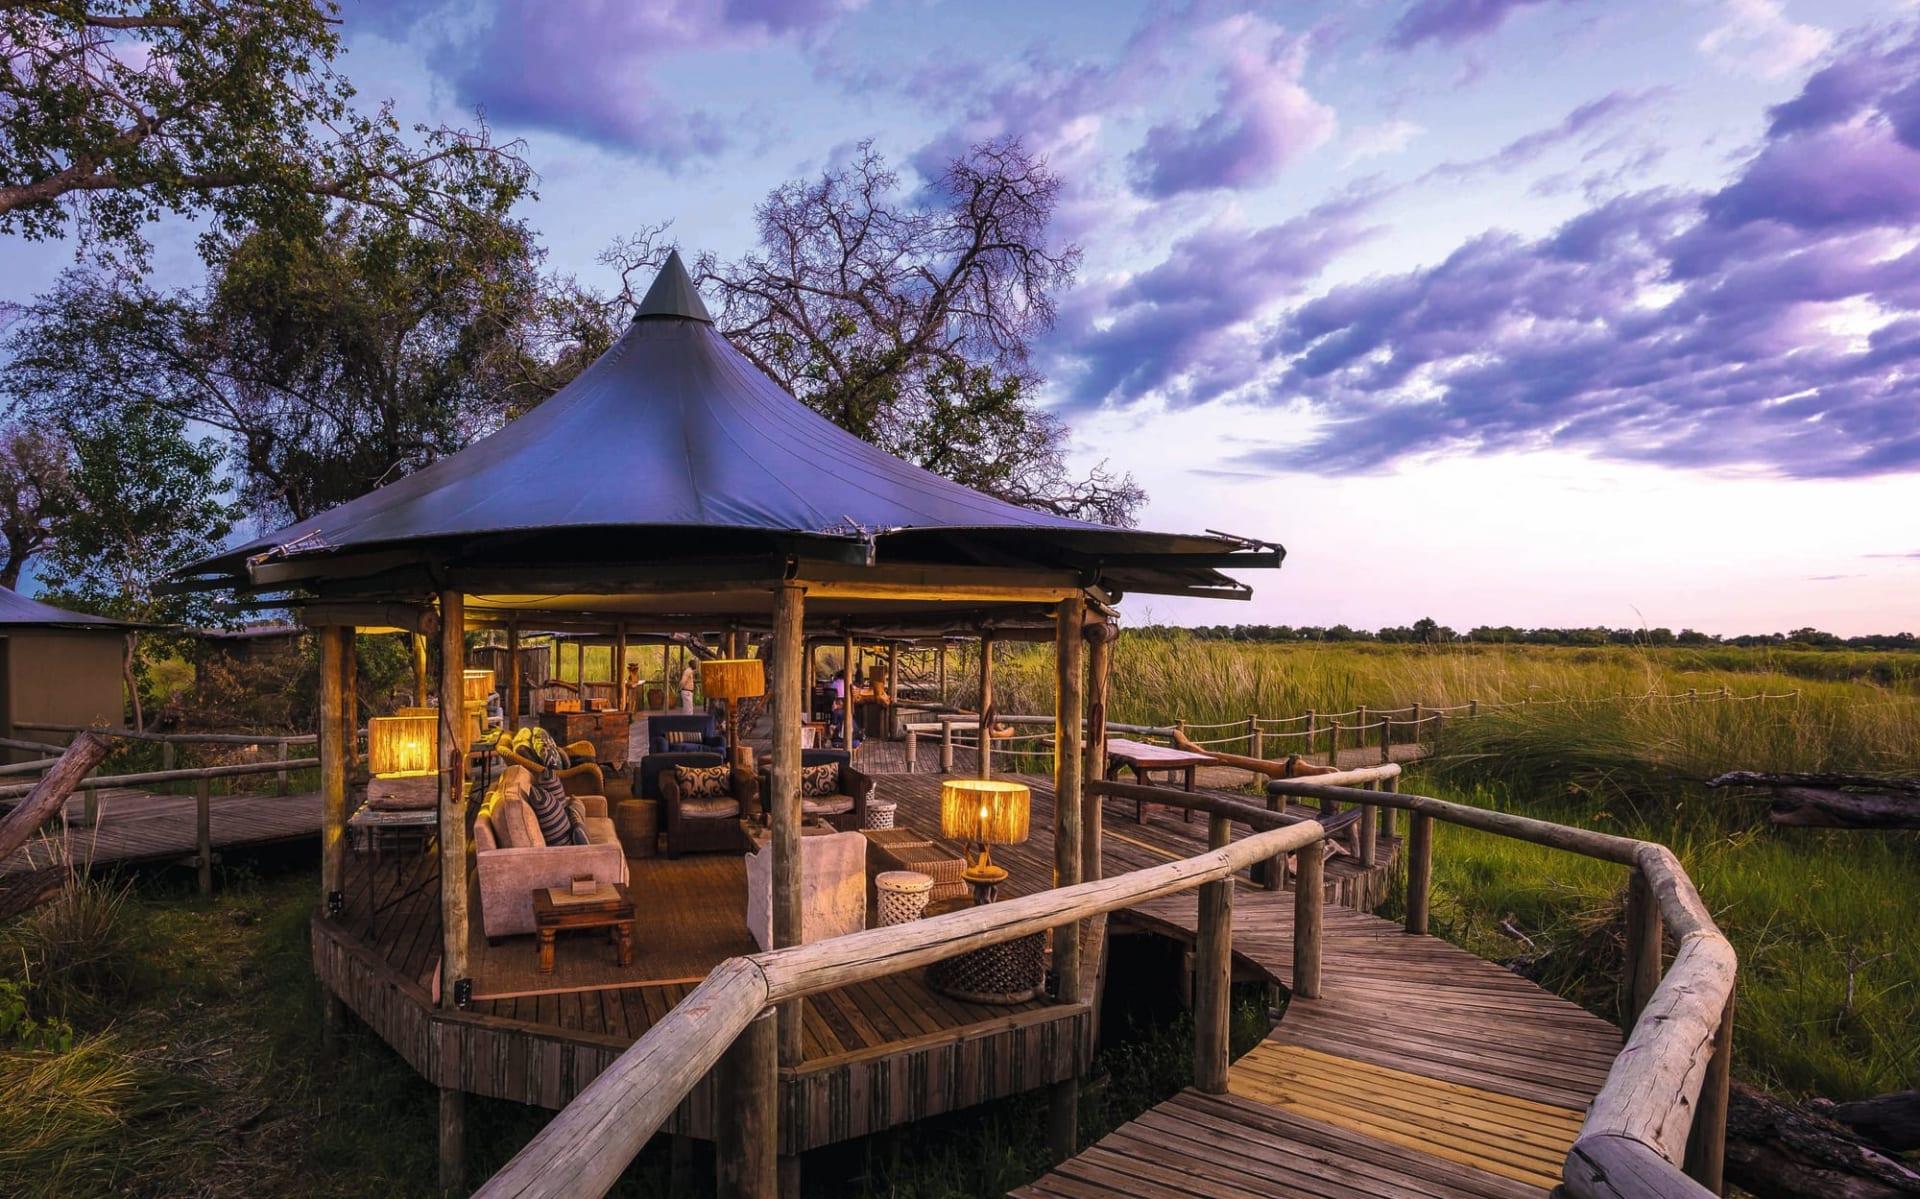 Little Vumbura in Okavango Delta: Little Vumbura - Blick vom Steg zum Chillout Area mit Ausblick